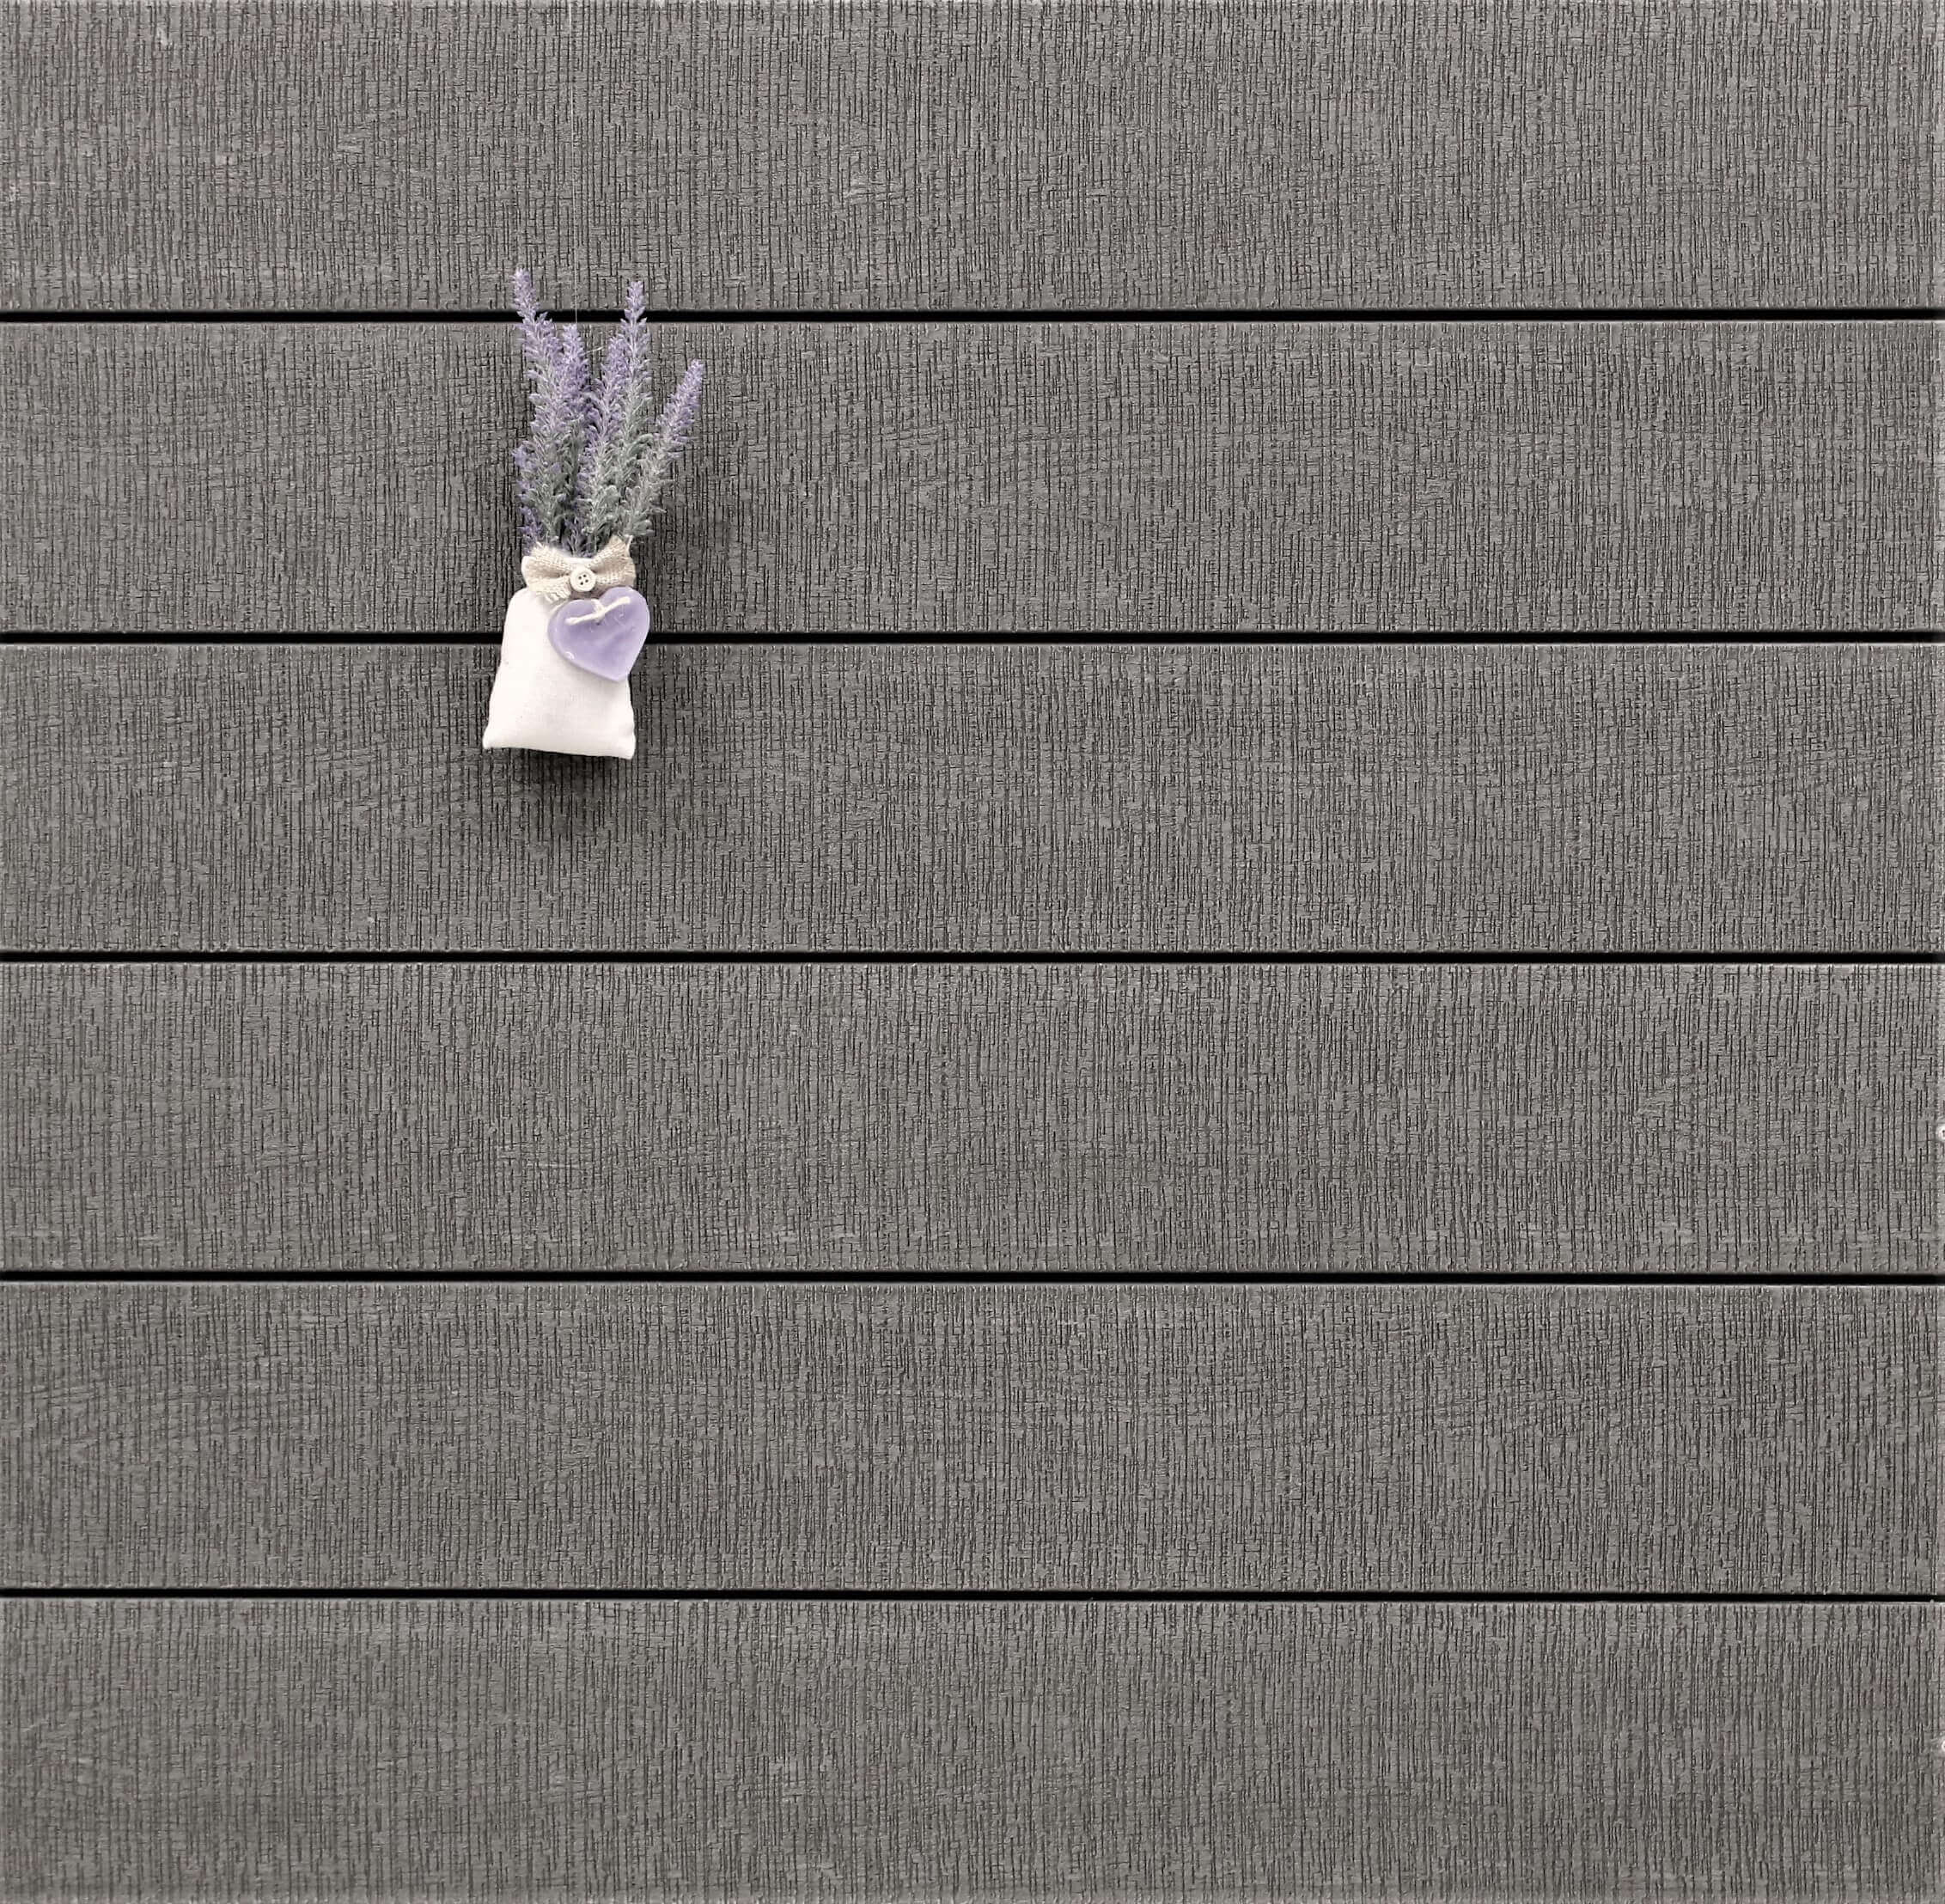 WPC Terrasse massiv, Vollprofil, 22 x 143 bis 4800 mm, sägerau grob im Farbton hellgrau, 7,95 €/lfm